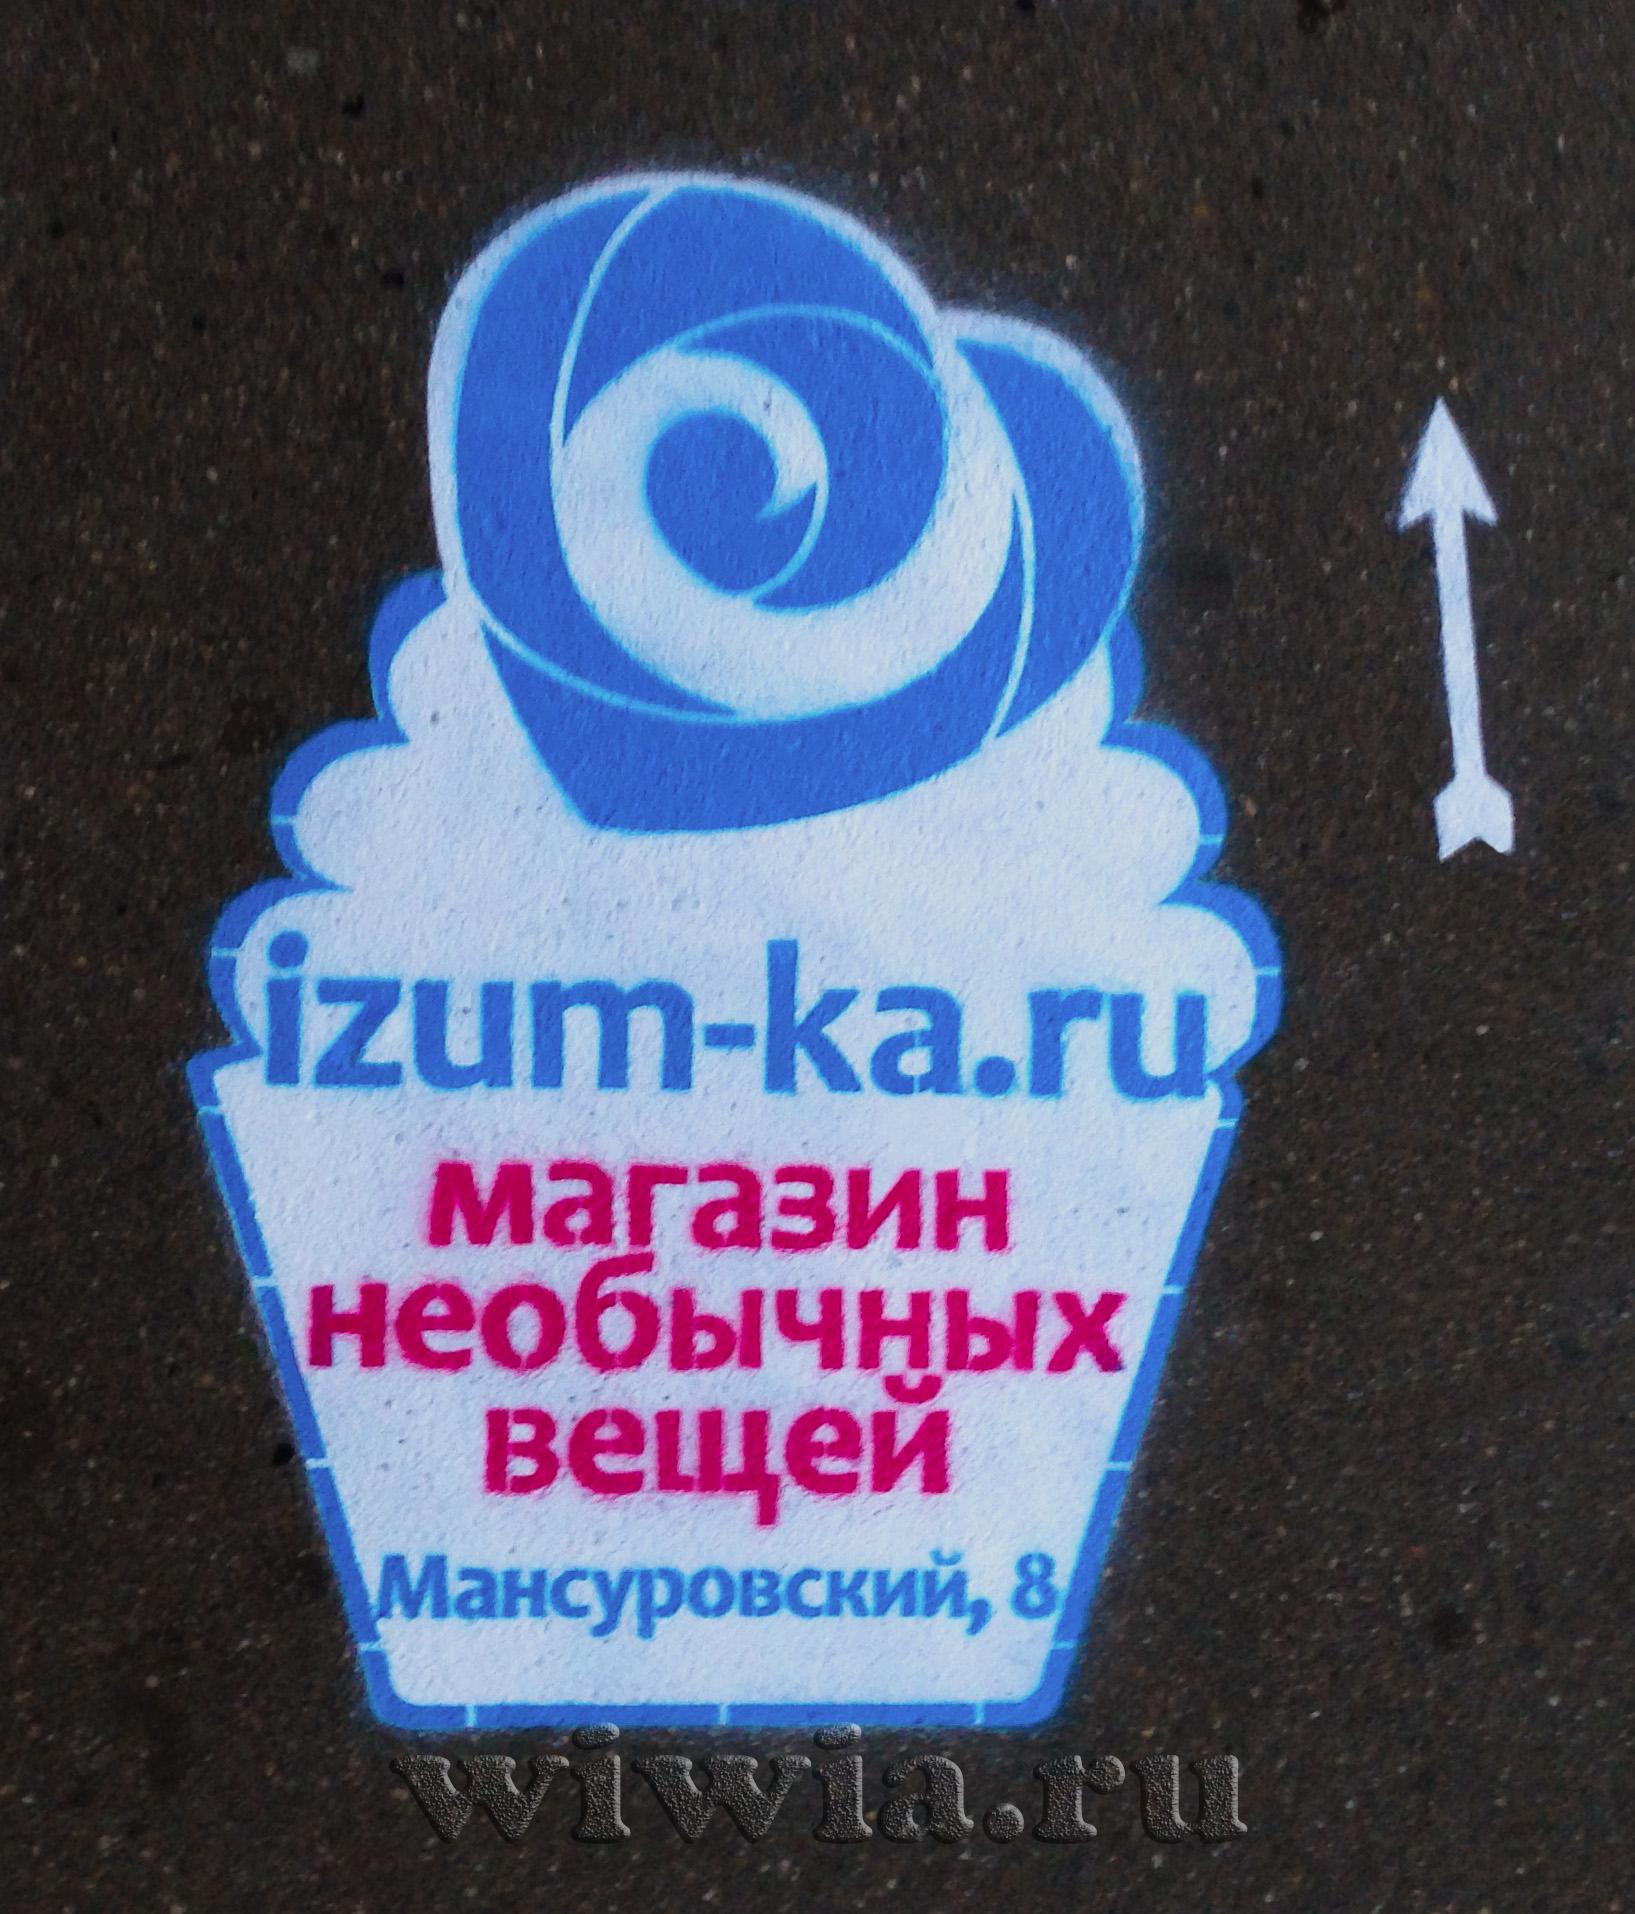 Реклама на асфальте для магазина.